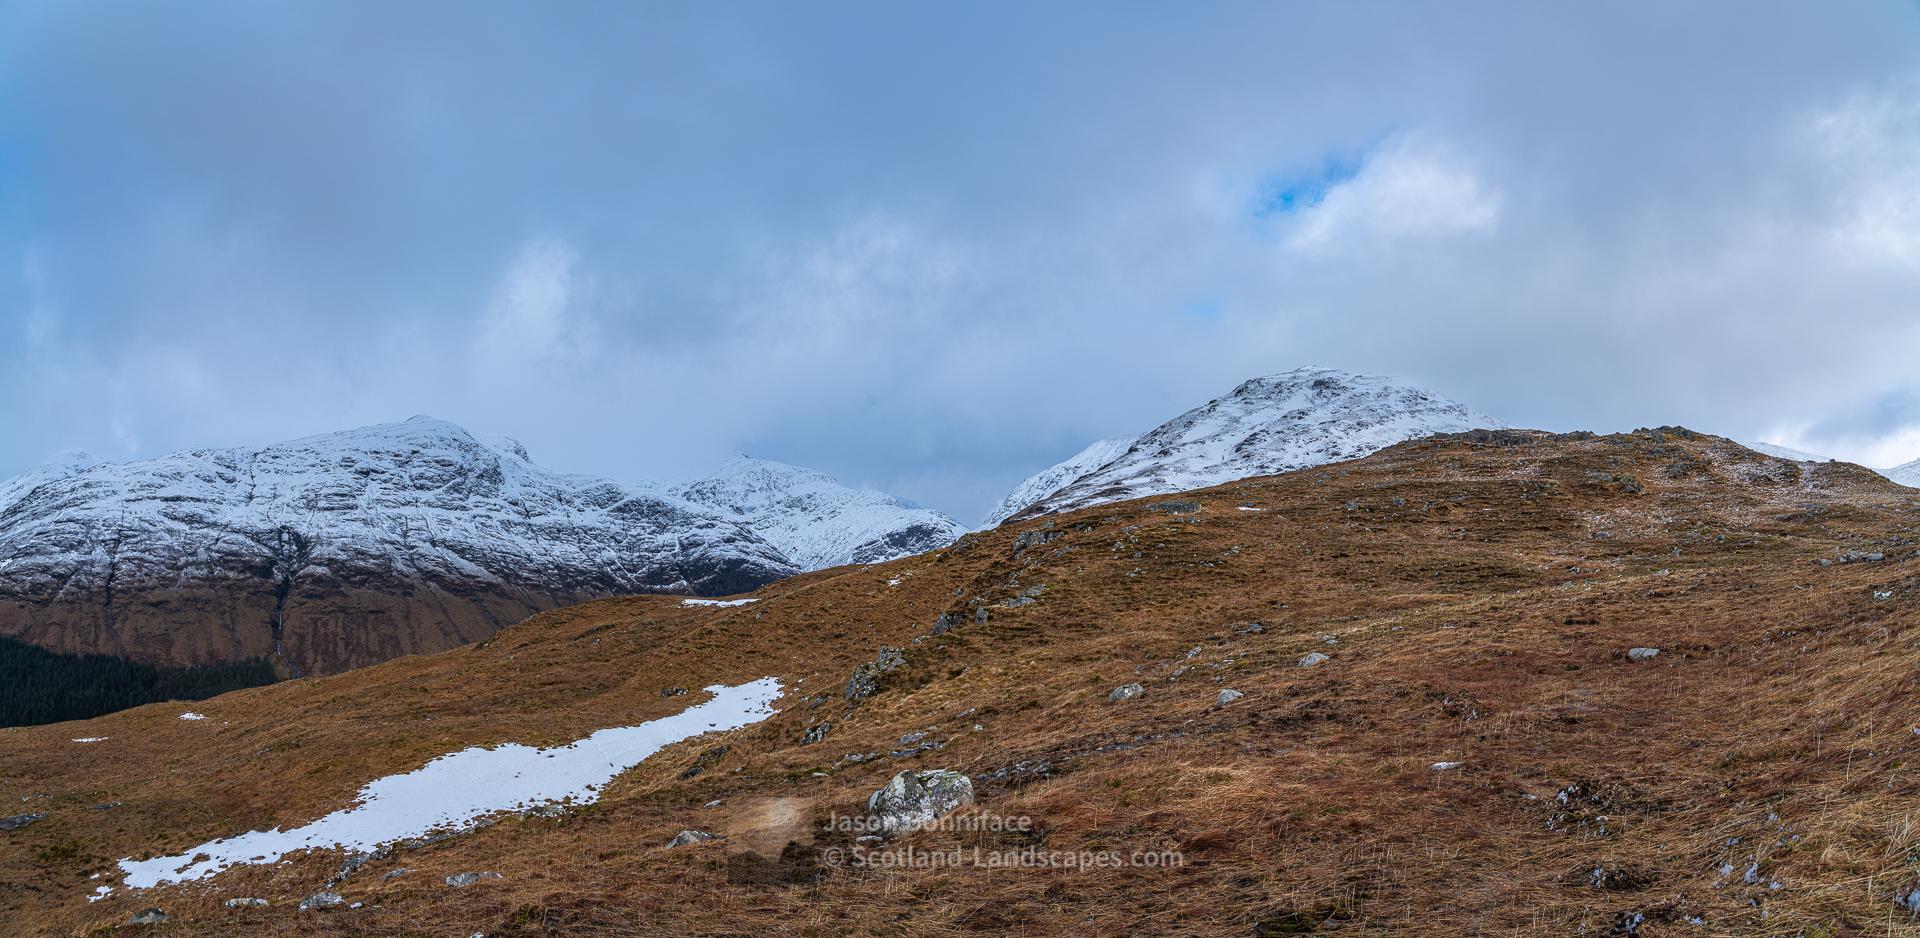 Meall a' Bhuiridh and the Corbett Beinn Maol Chaluim on the west side of Glen Etive